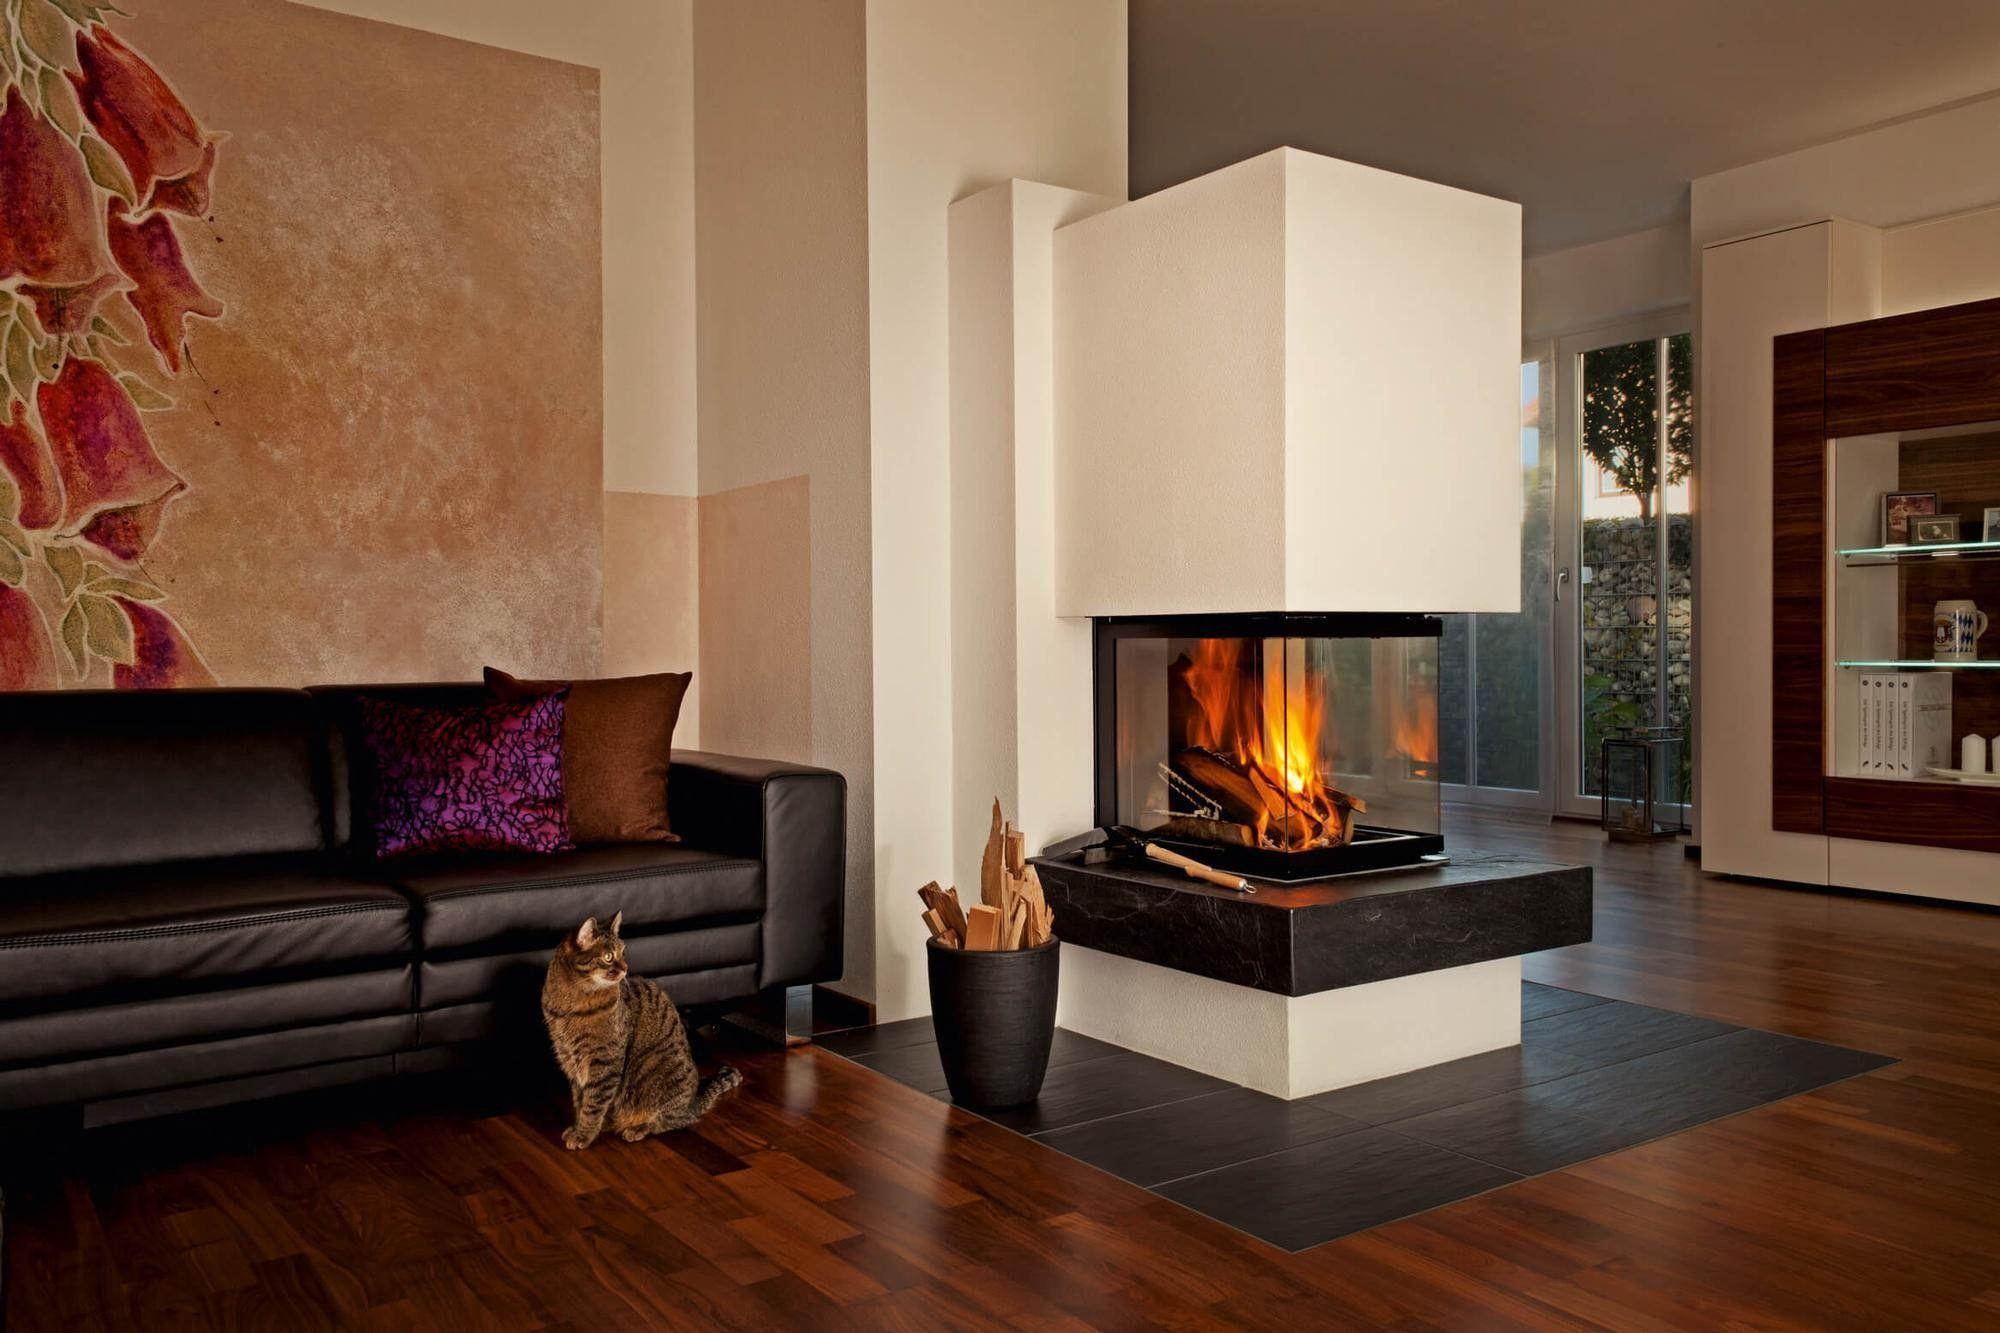 Rüegg Kamine fireplaces cheminée kamin ofen house interior ofen